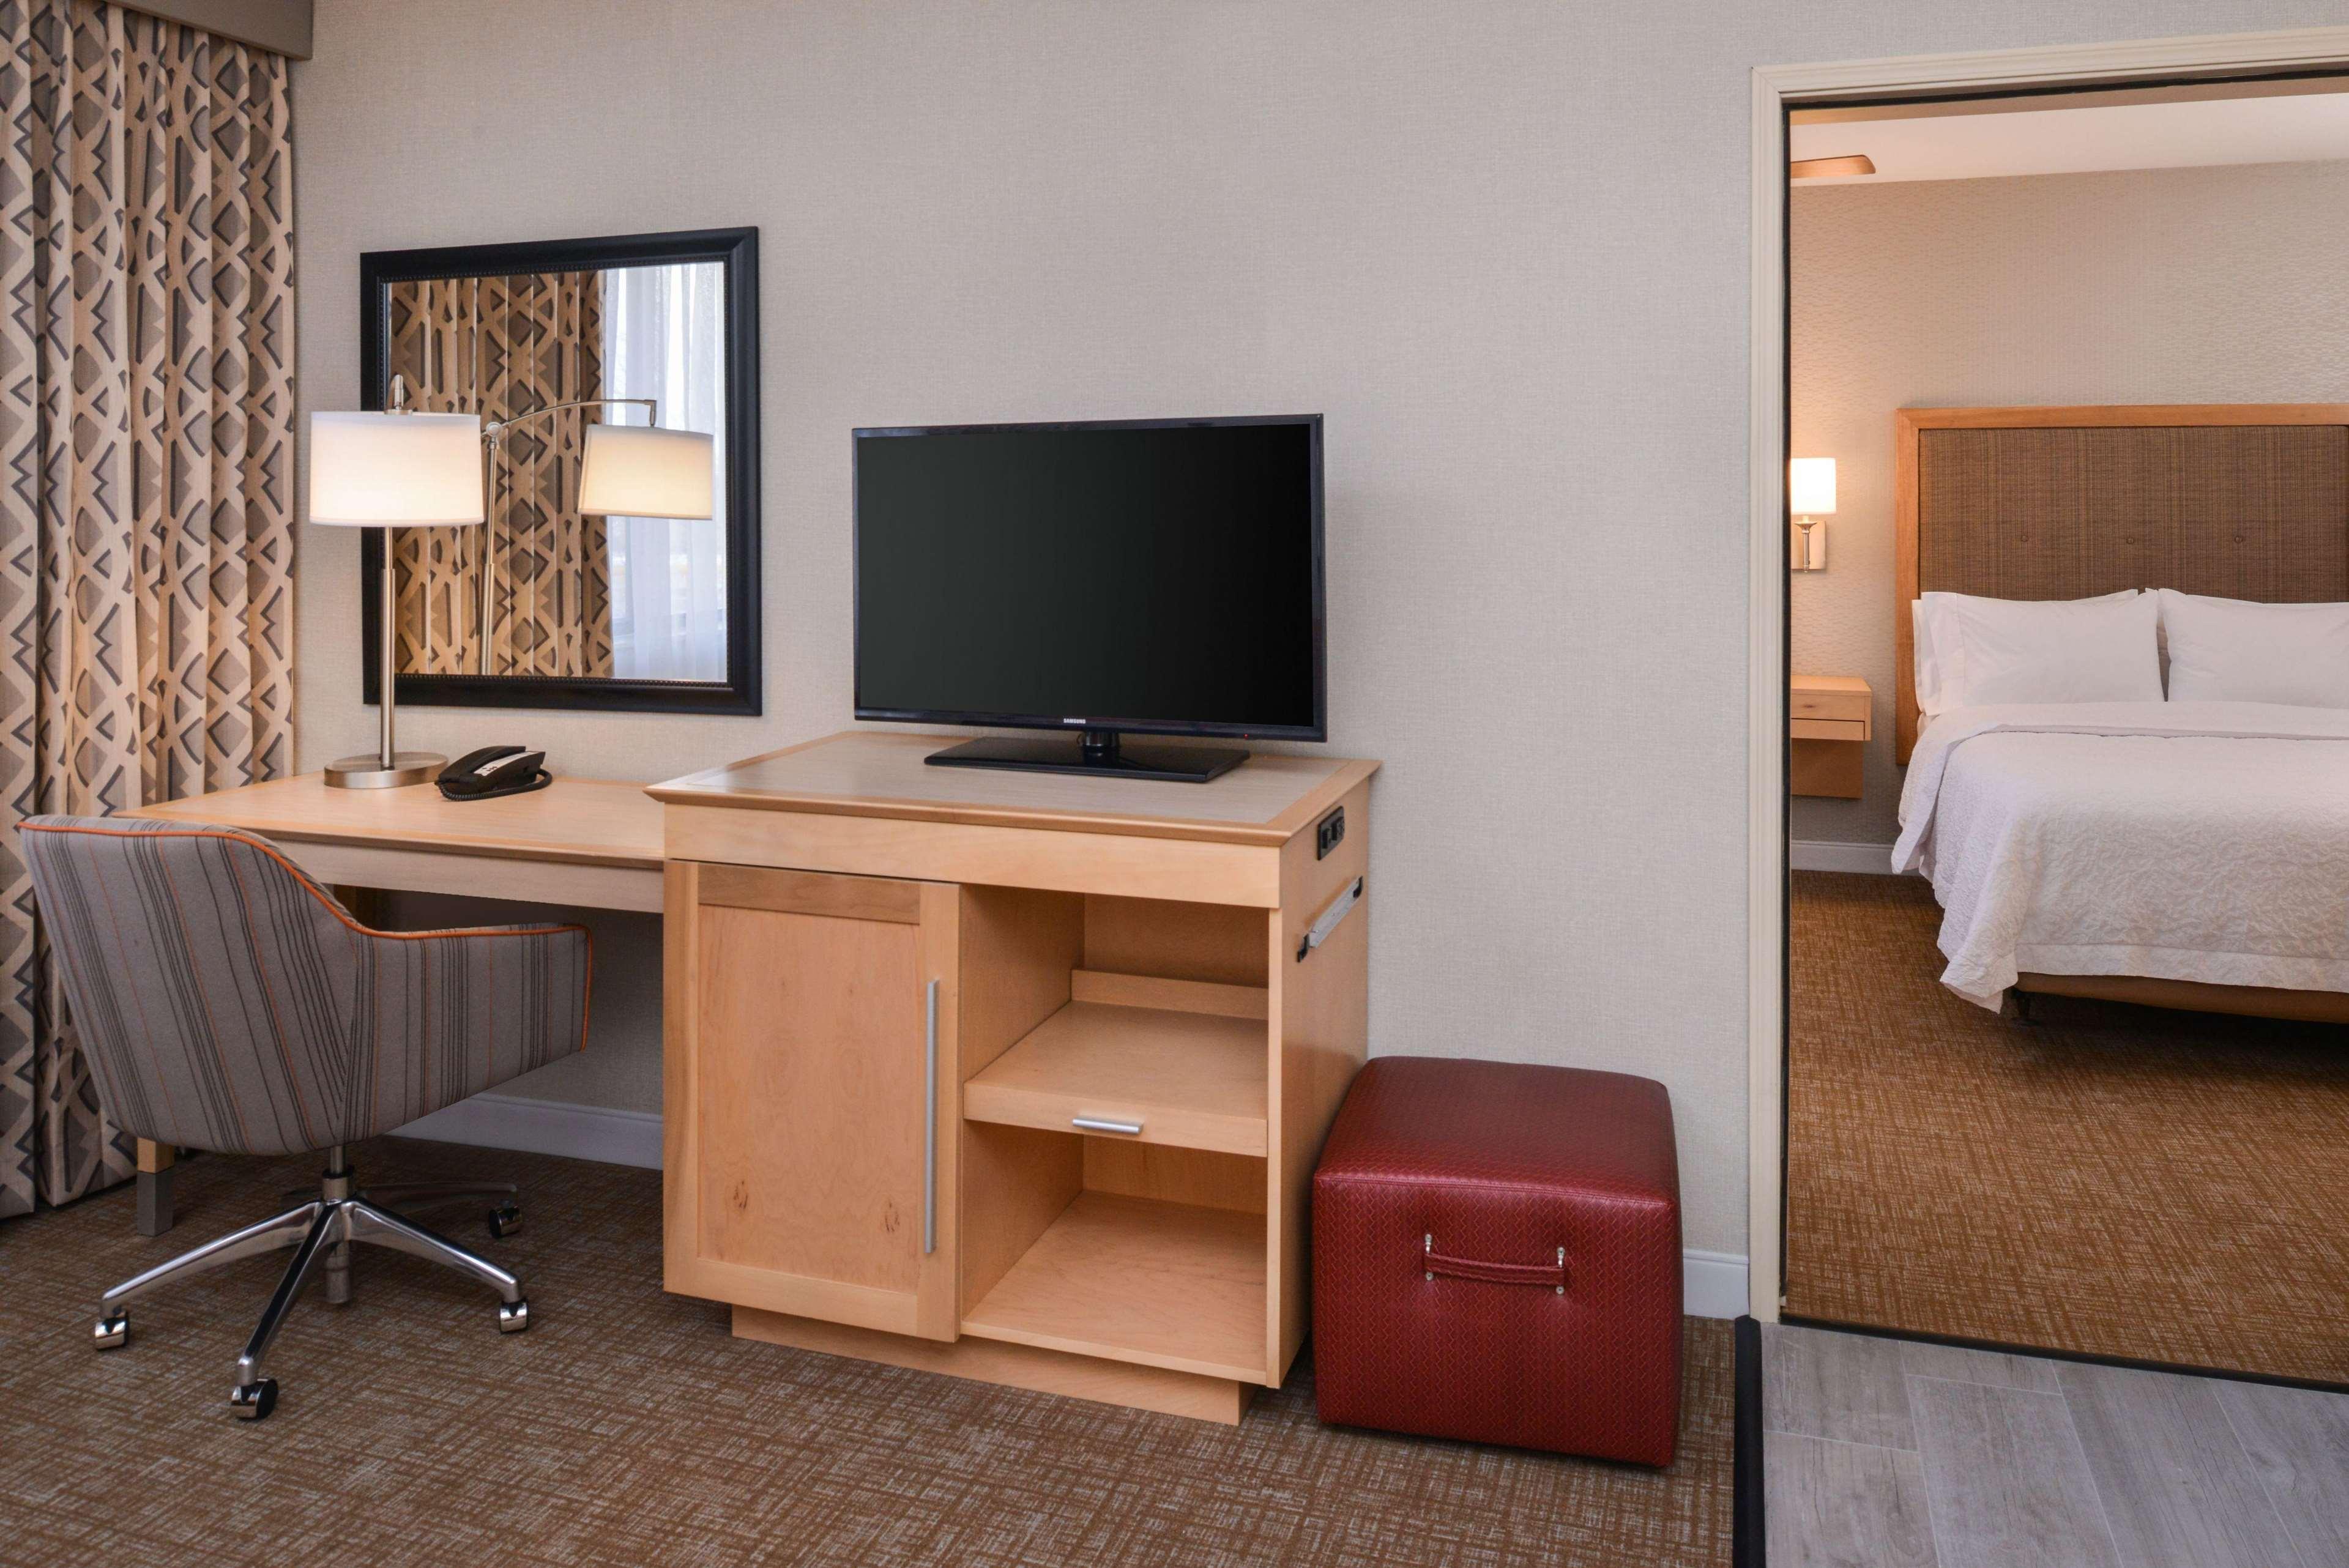 Hampton Inn & Suites Denver-Speer Boulevard image 41